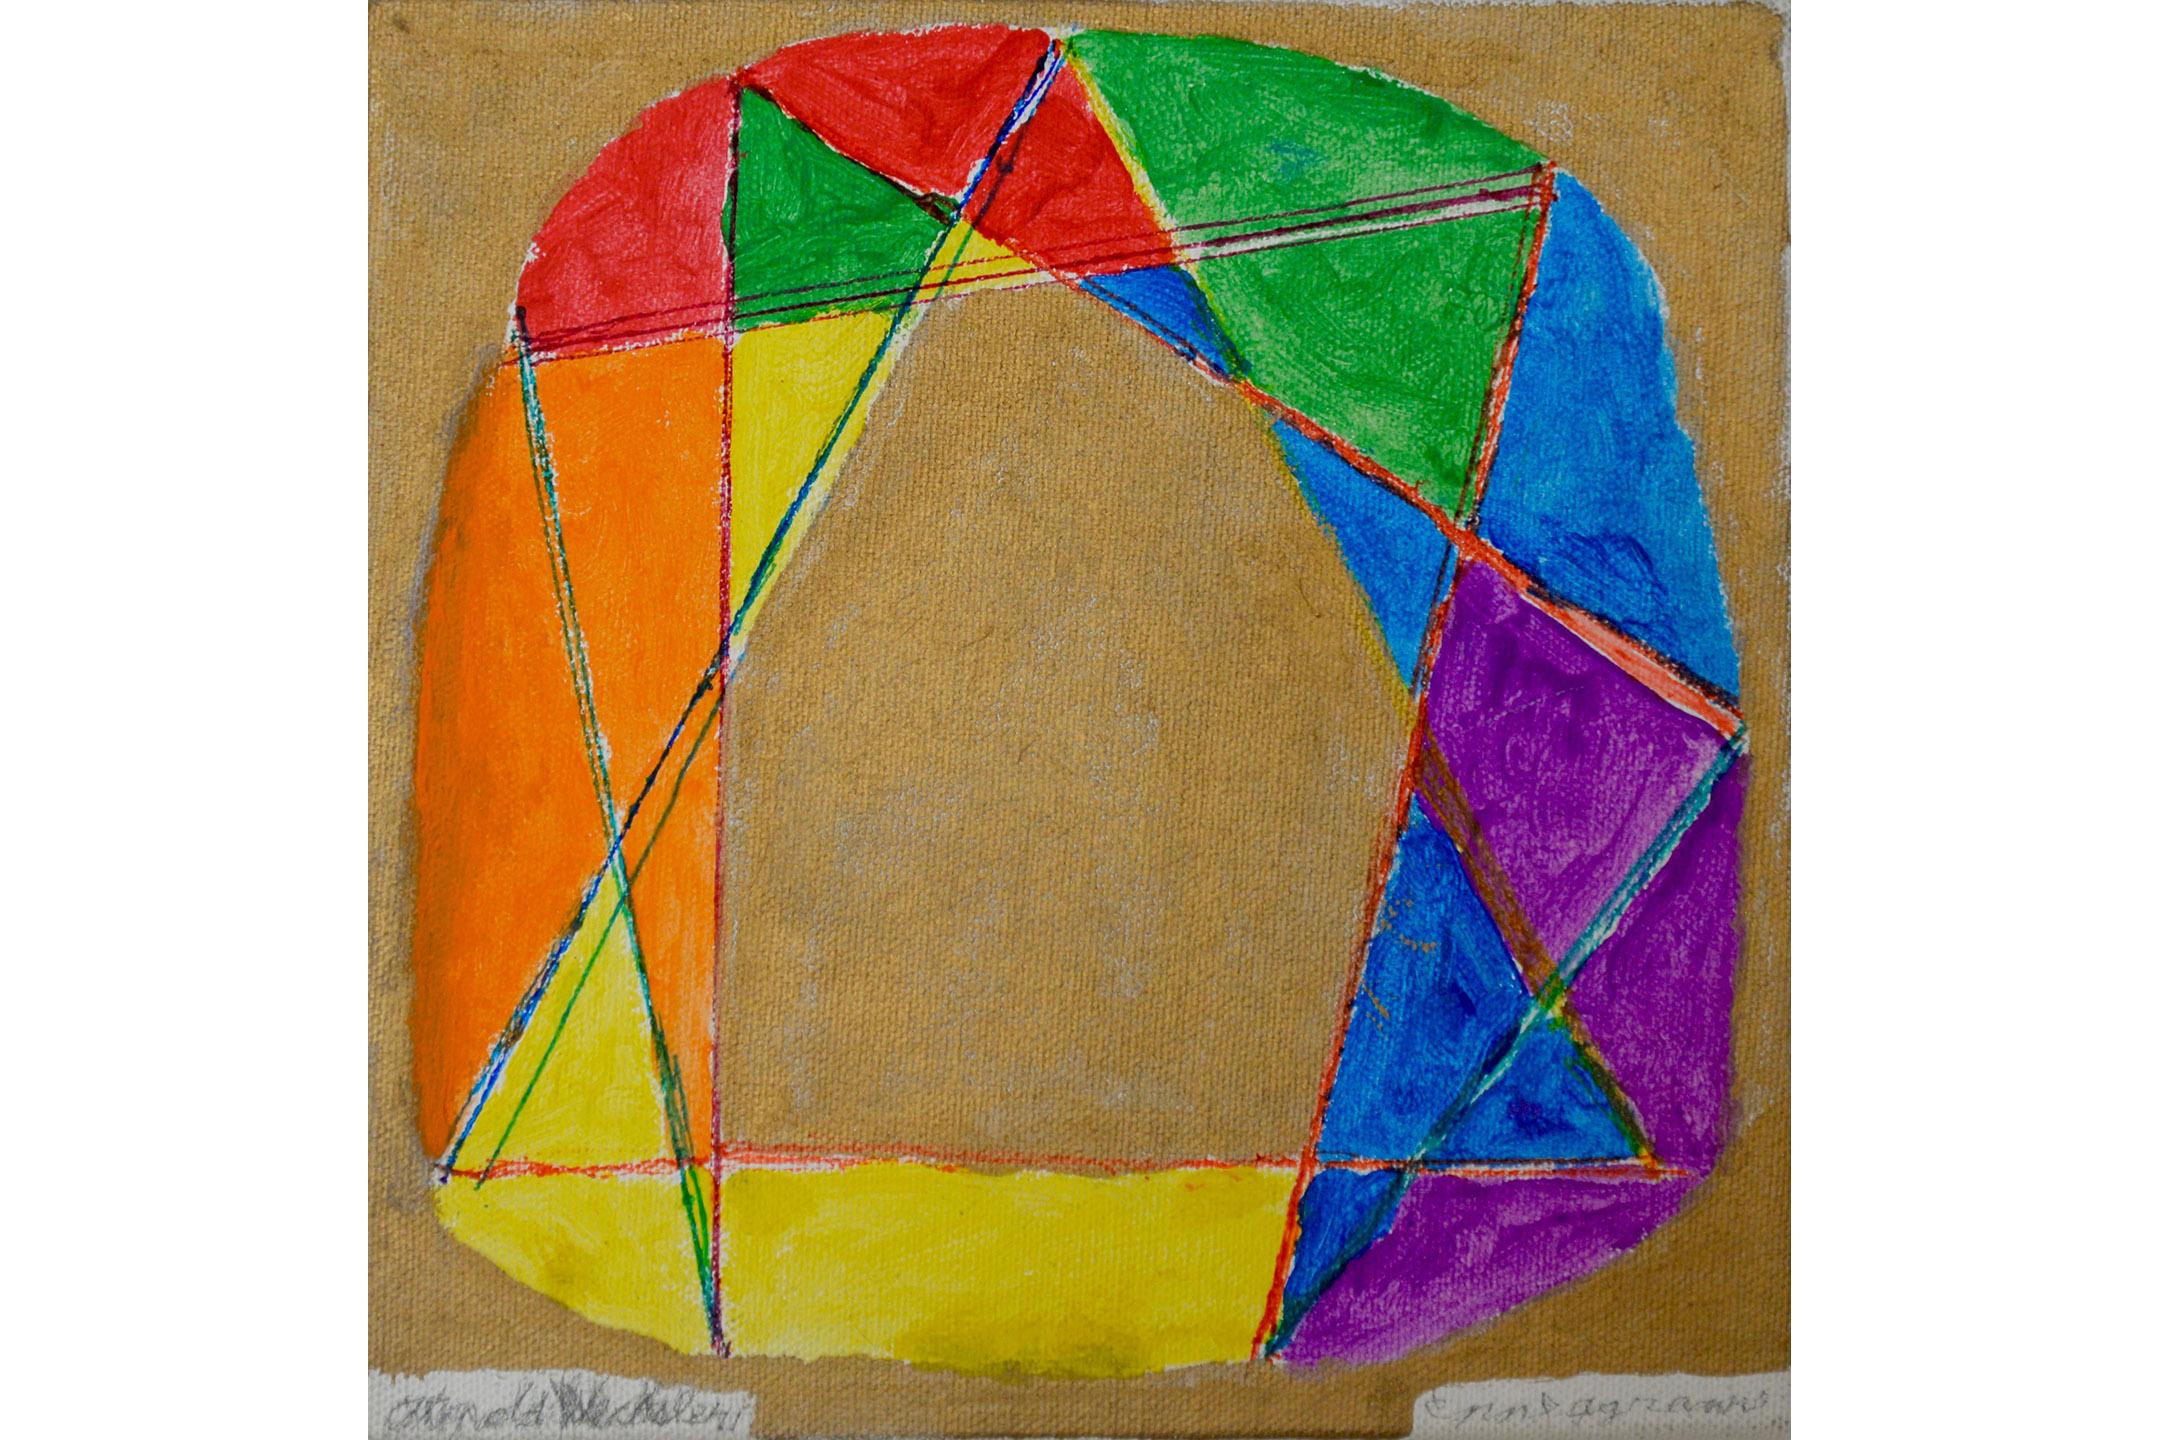 "Arnold Wechsler, Enneagrams, Mixed media on canvas, 8"" x 8"", 2016"